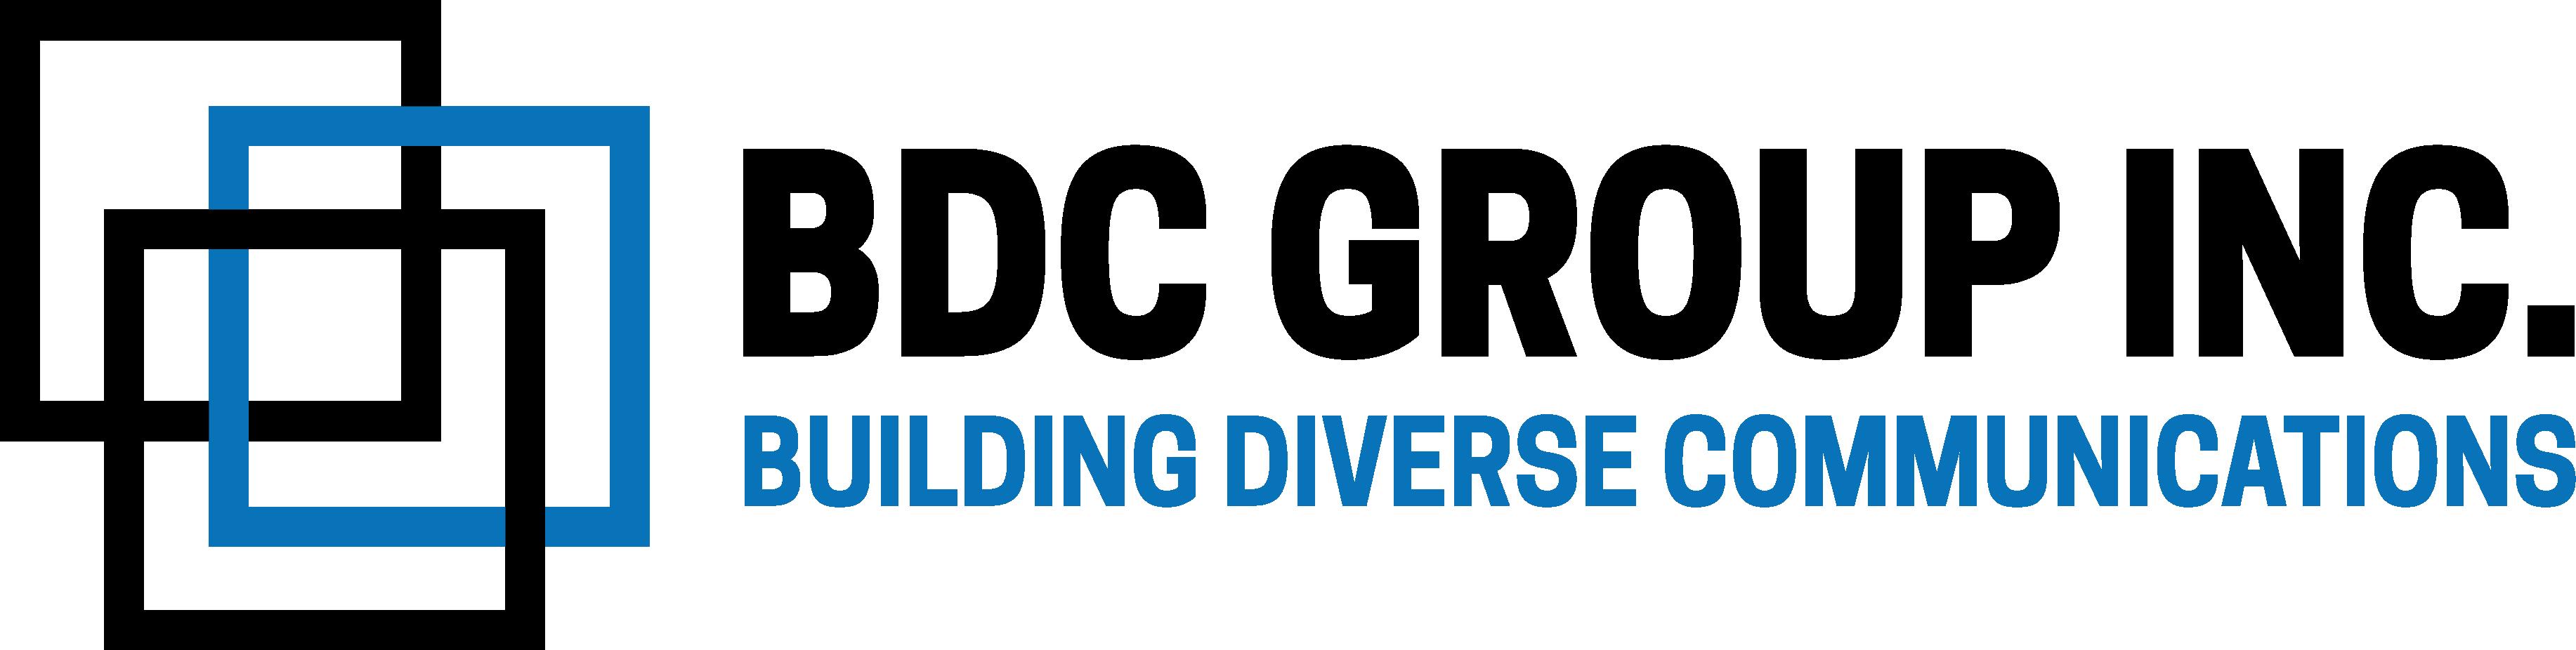 new bdc logo 2020 straight